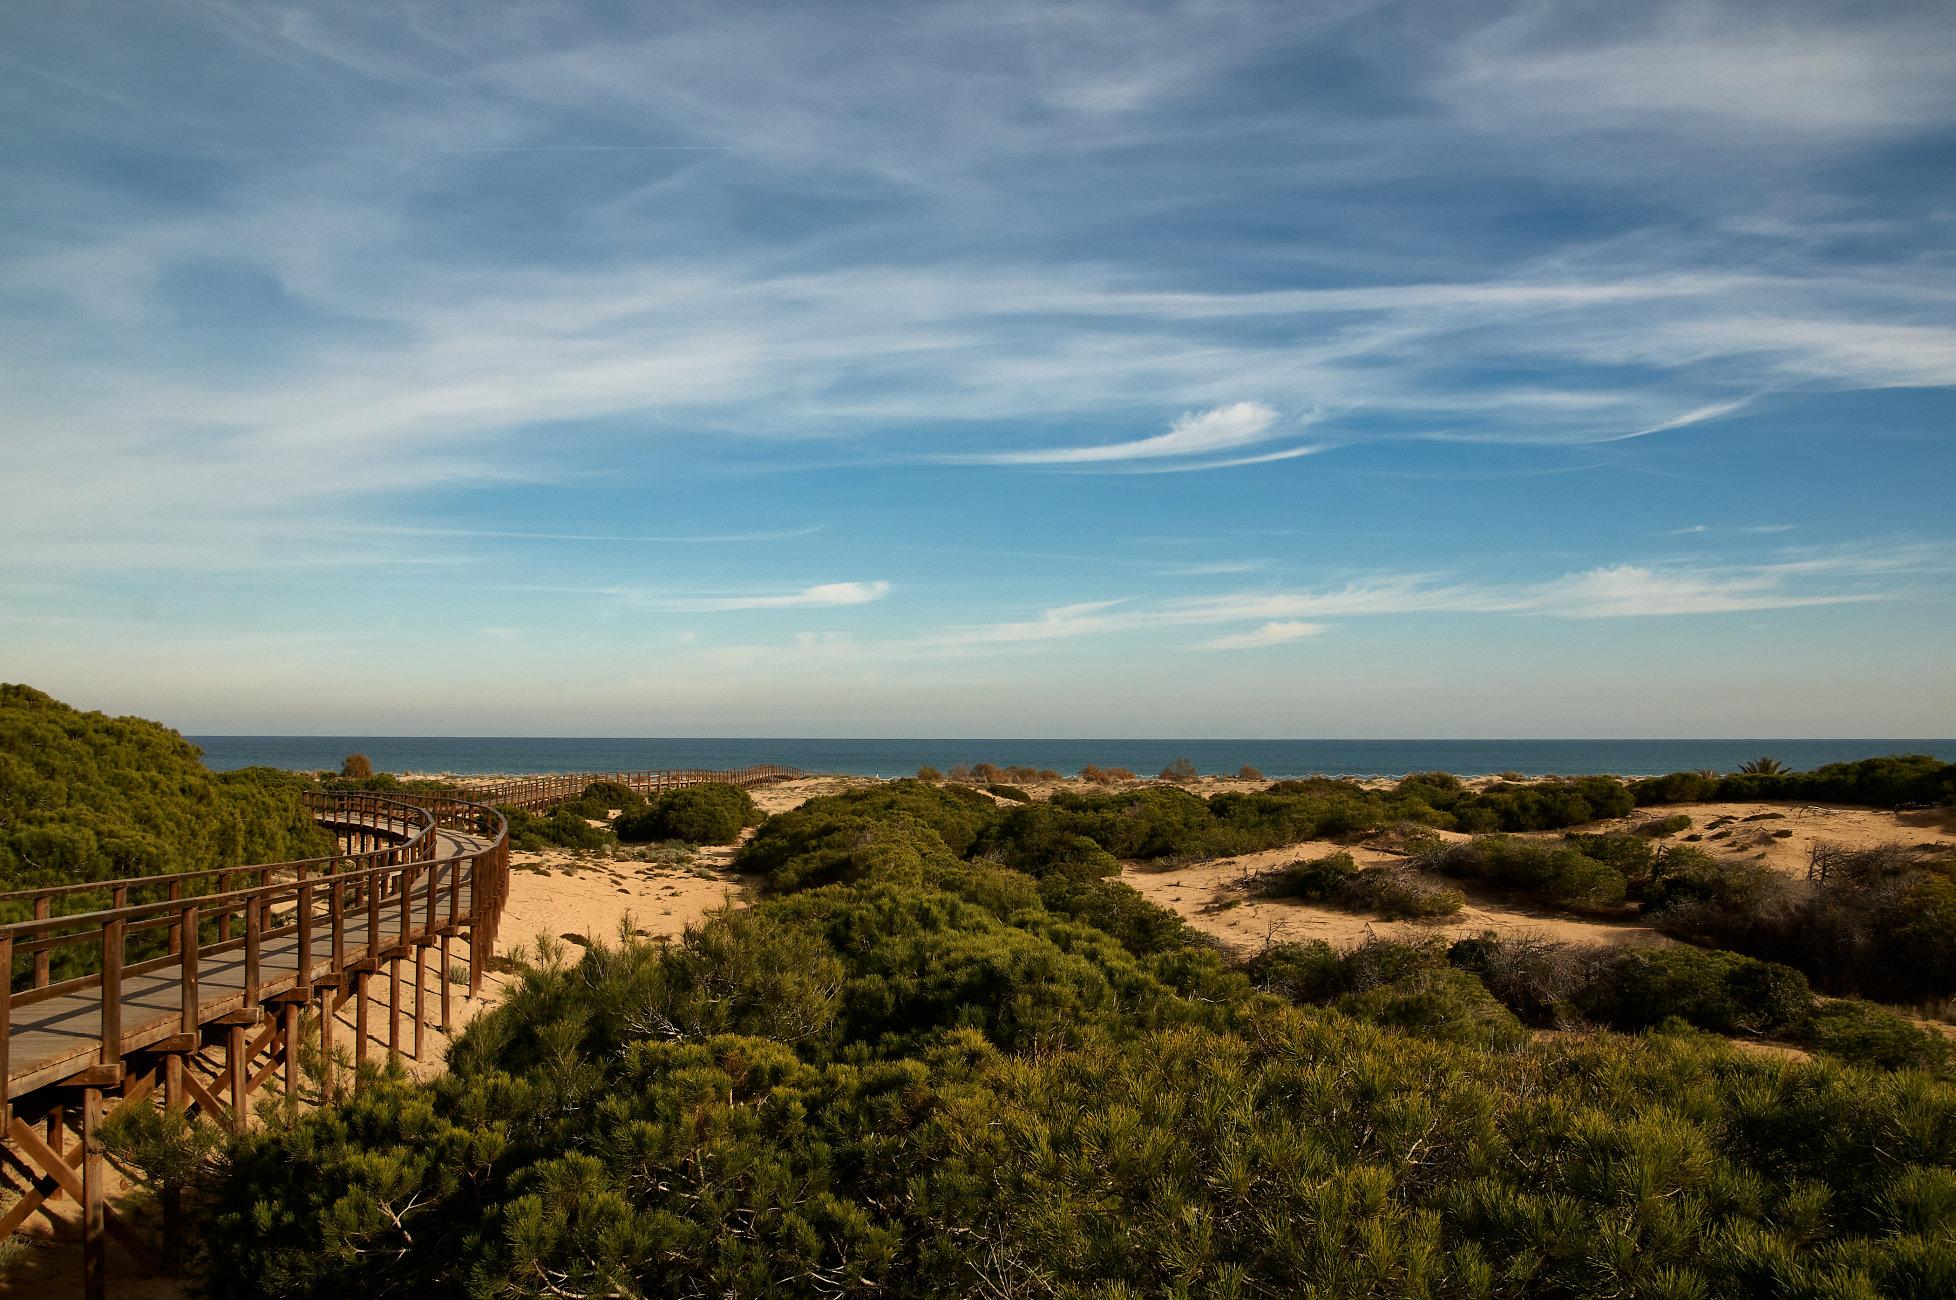 Sand dunes un Alicante